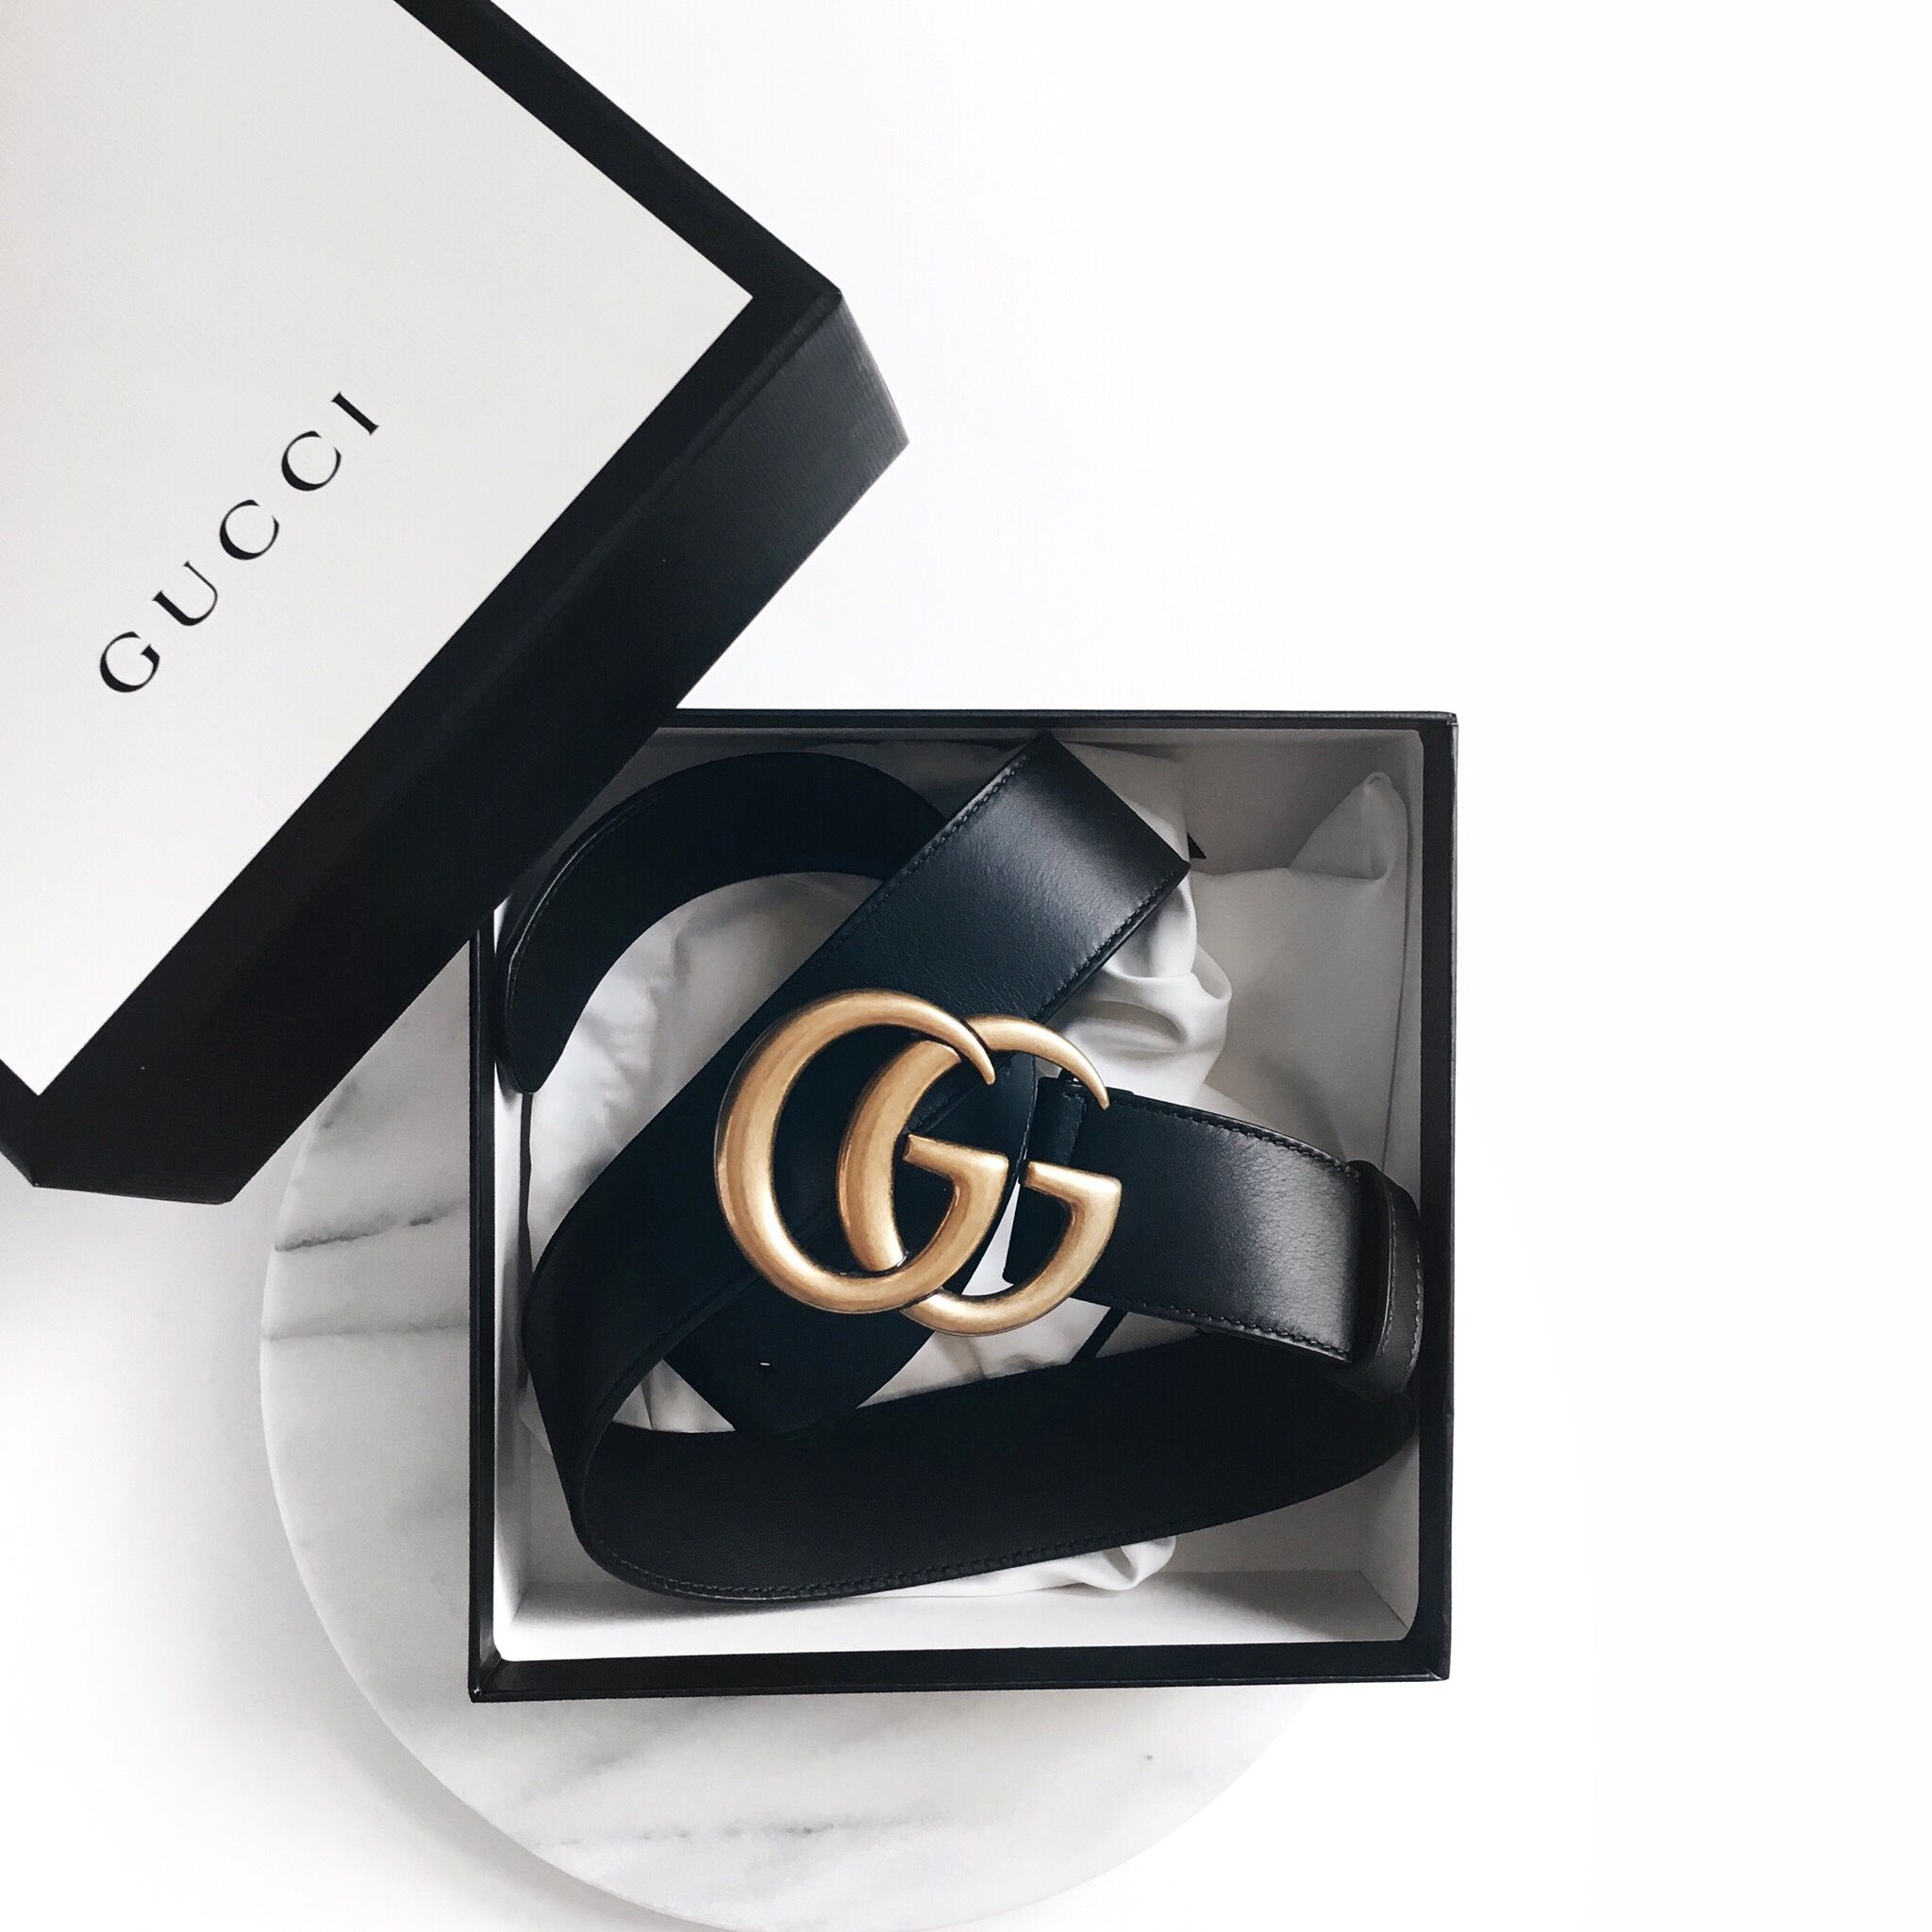 528294248a45 pin & insta: ellapopov Gucci Bag 2017, Gucci Bags, Gucci Handbags, Gucci